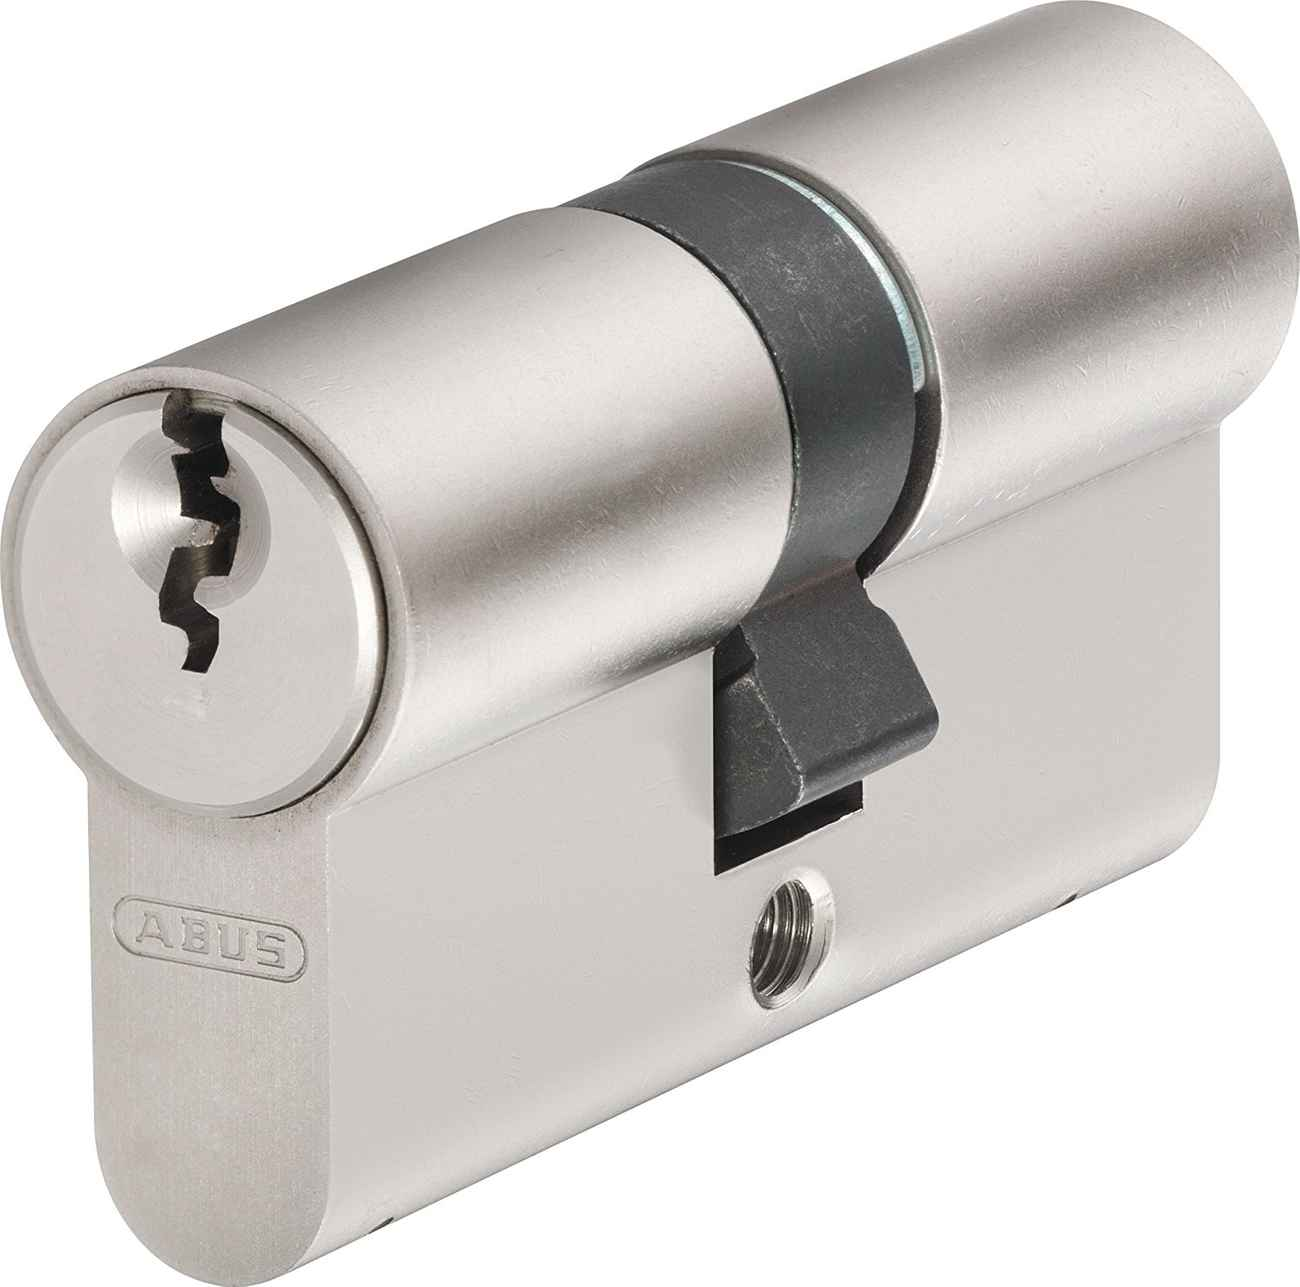 Abus Profilzylinder D6X 40/45 mm, 5 Schlüssel, Codekarte